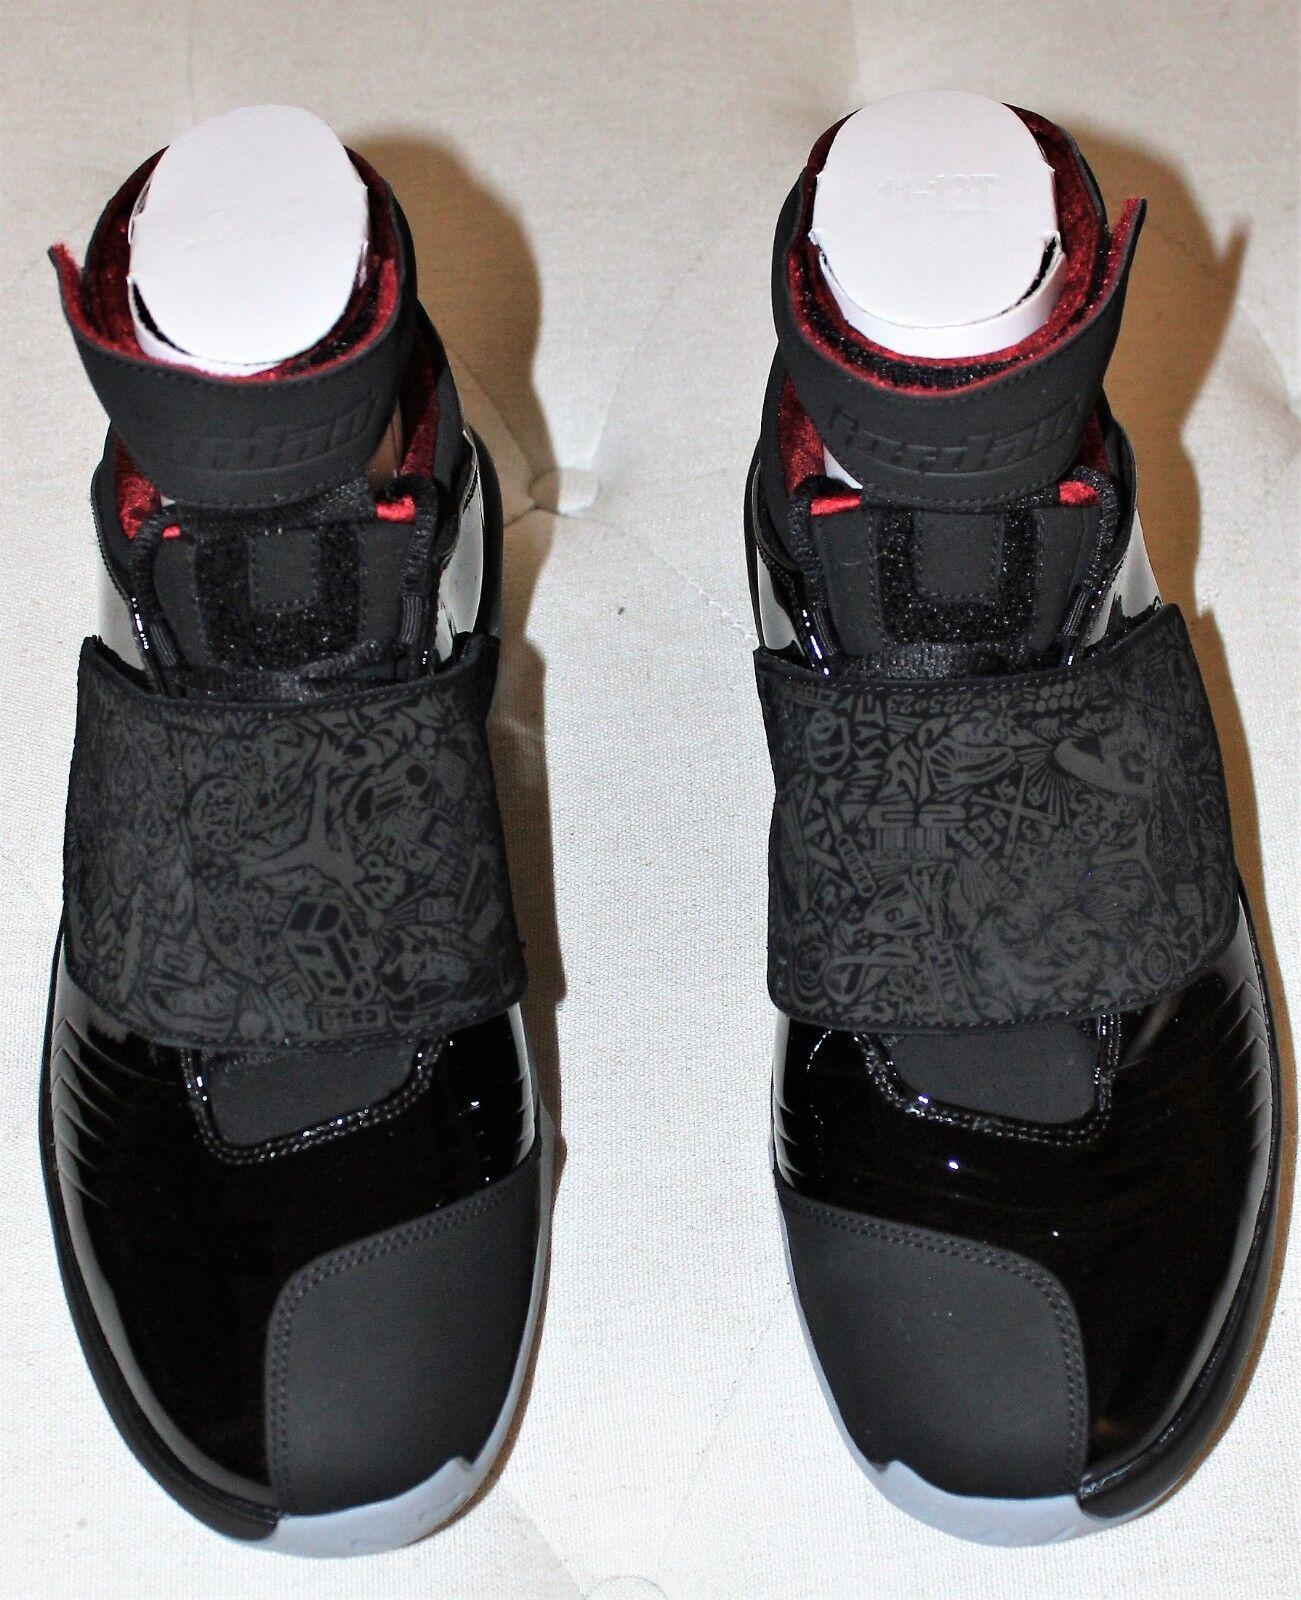 Air Jordan Xx 20 Og black Stealth red Estilo  310455001 Bred Tgolds '05 size